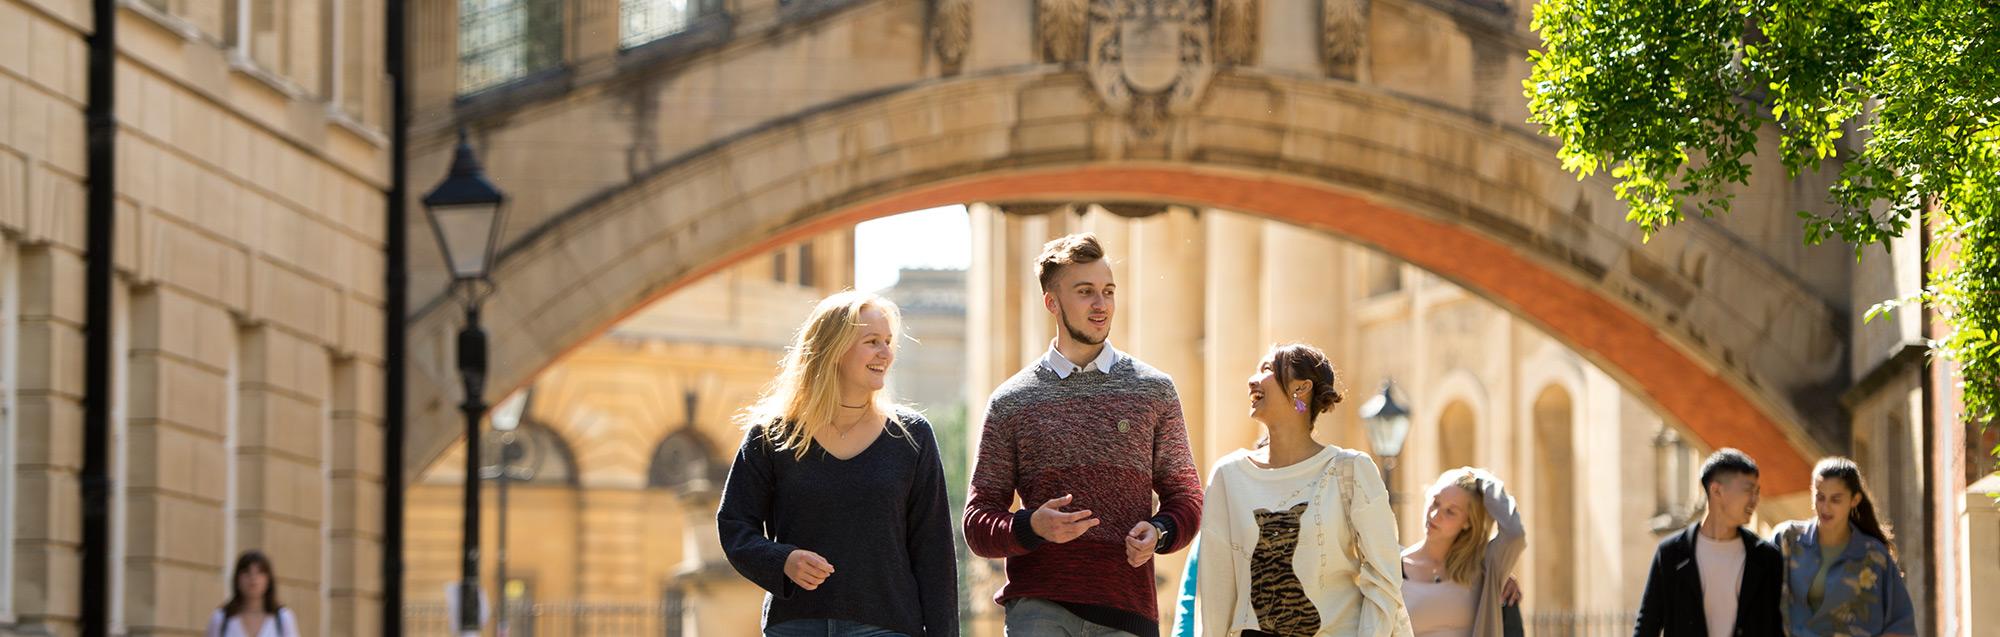 Oxford International Oxford